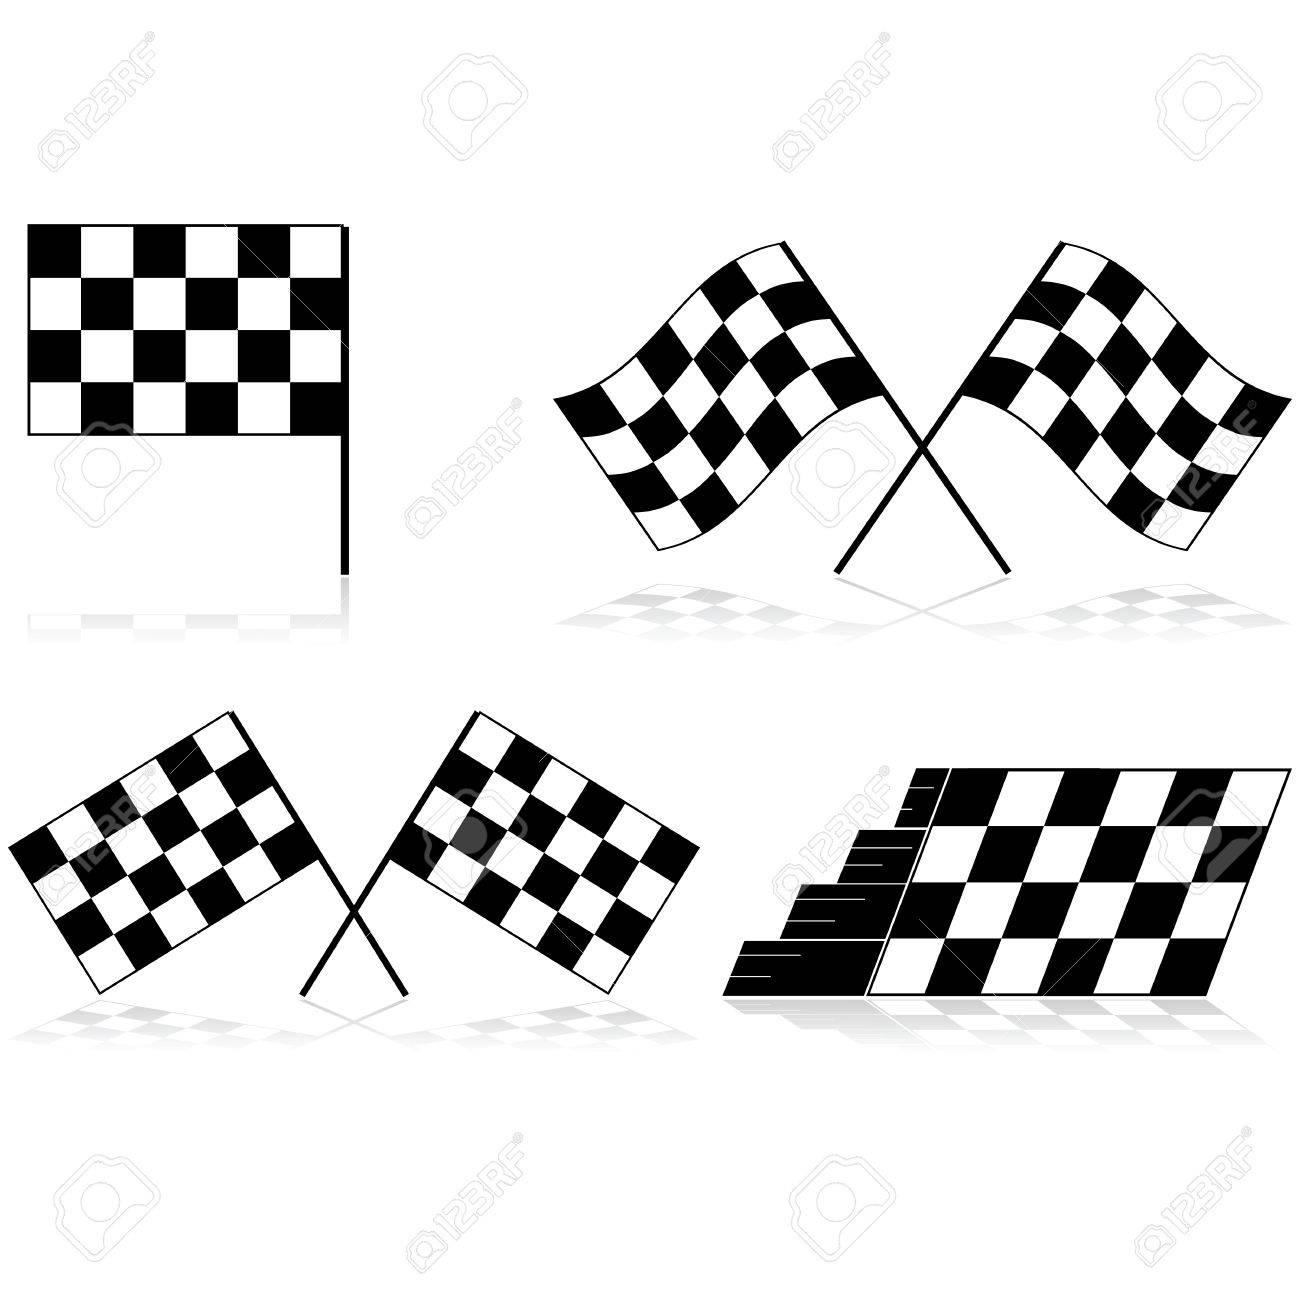 0 Formula 1 Stock Illustrations, Cliparts And Royalty Free Formula ...